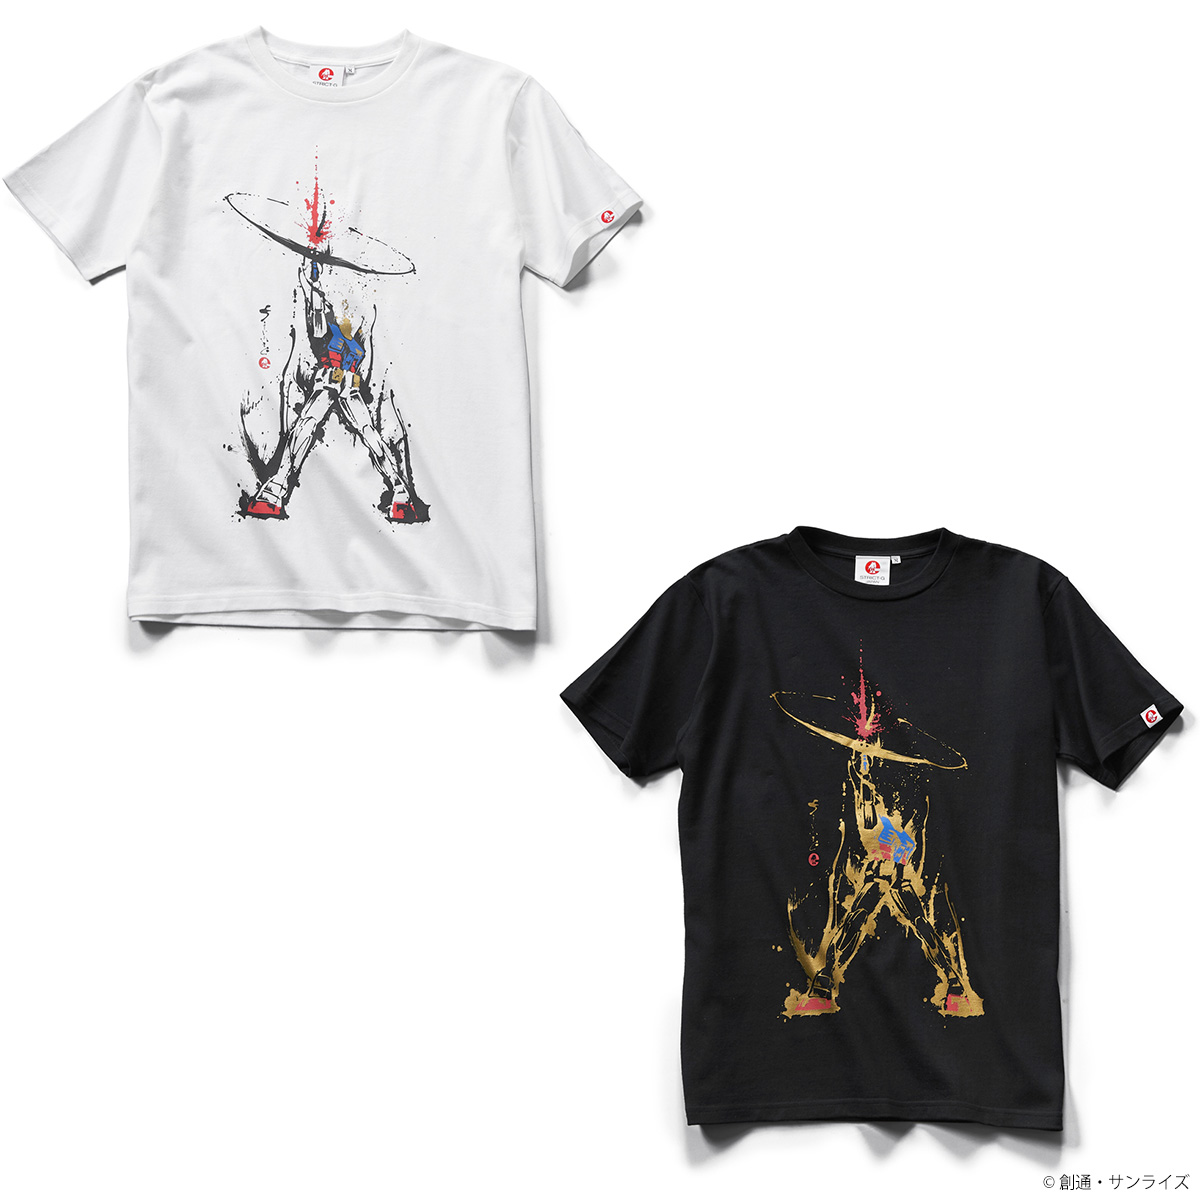 STRICT-G JAPAN『機動戦士ガンダム』筆絵Tシャツ ラストシューティング柄